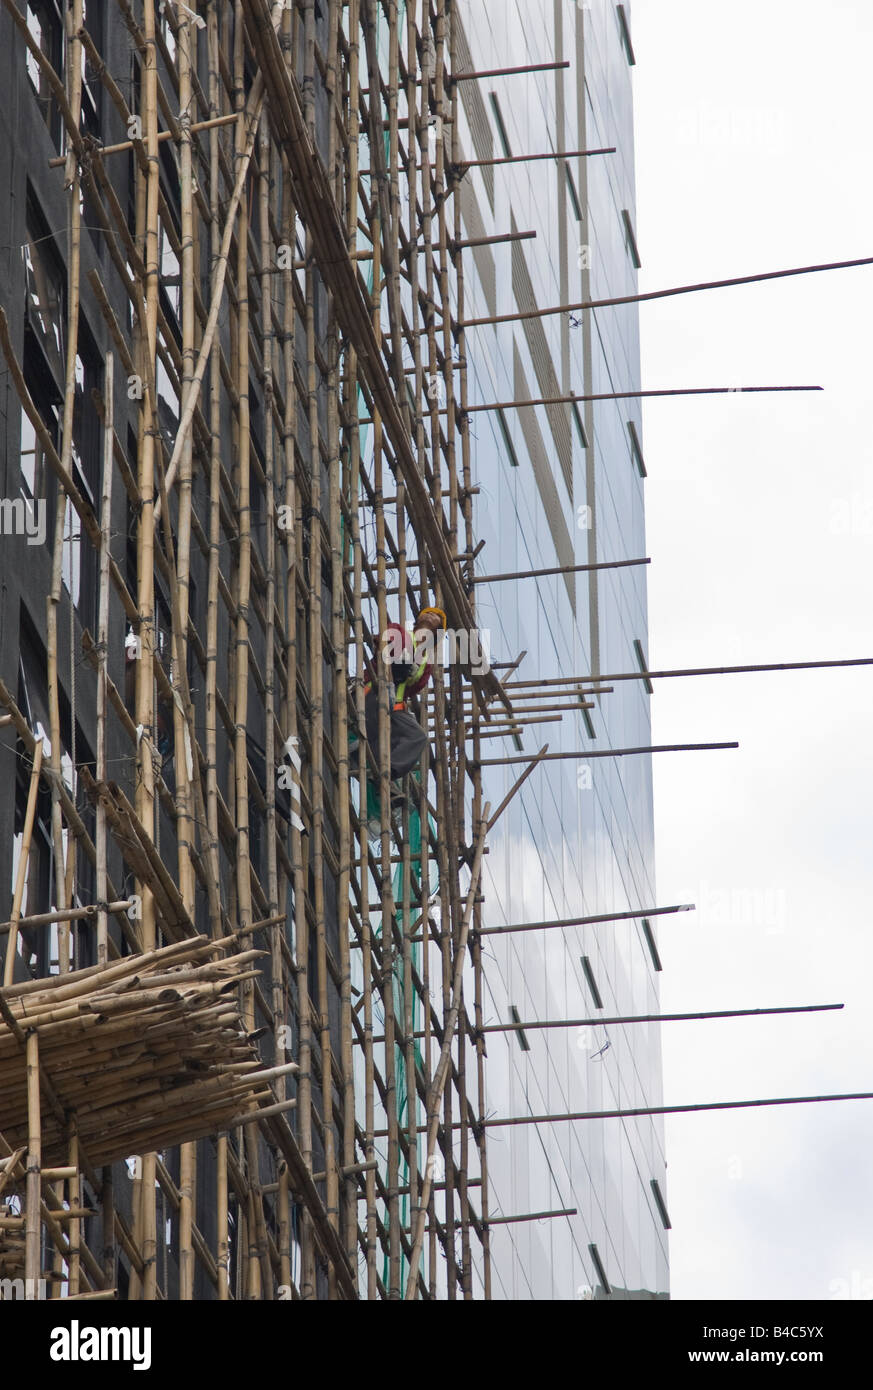 Bauarbeiter Gelehnt Aus Bambus Gerust Central Hong Kong Stockfoto